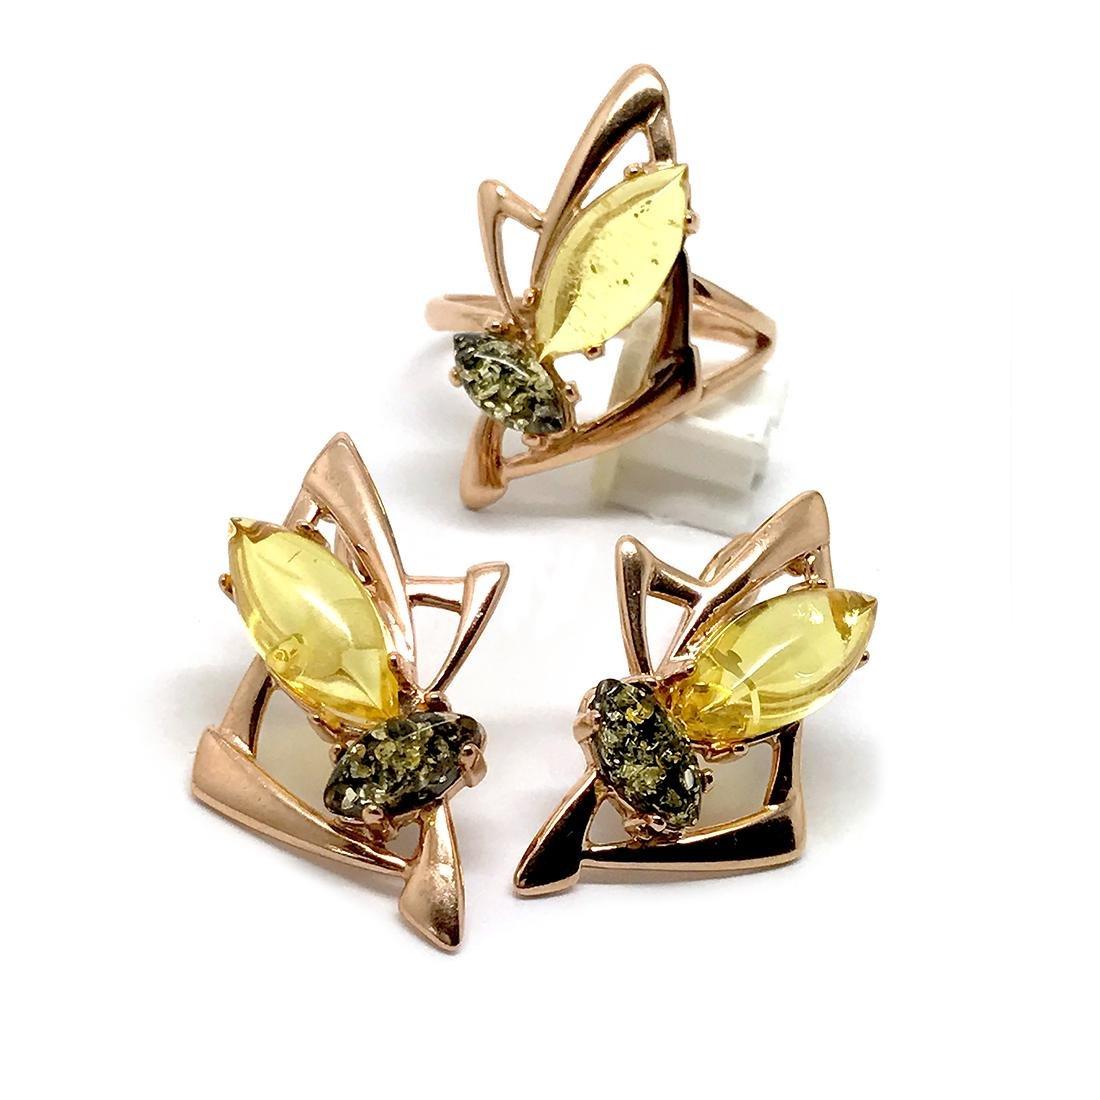 Baltic amber set Ring + Earrings Ag925 goldplated